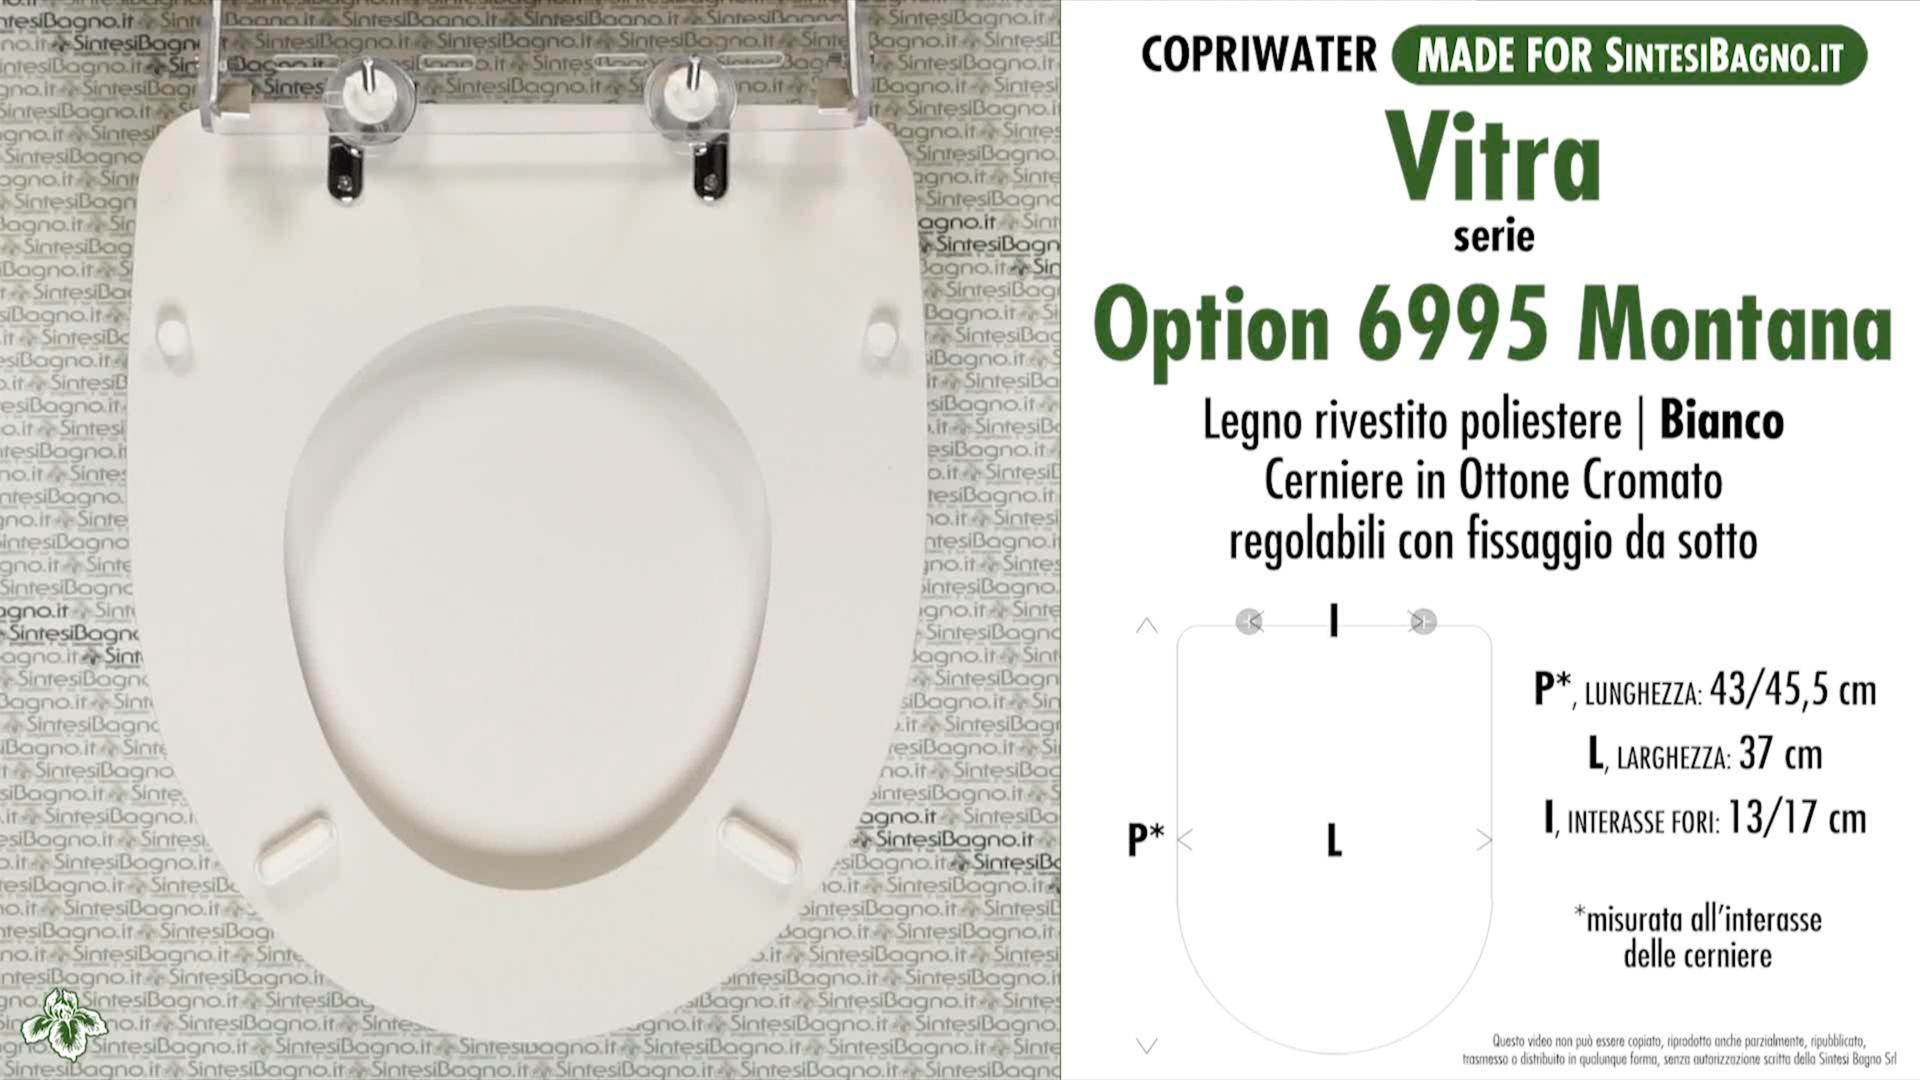 SCHEDA TECNICA MISURE copriwater VITRA OPTION 6995 MONTANA